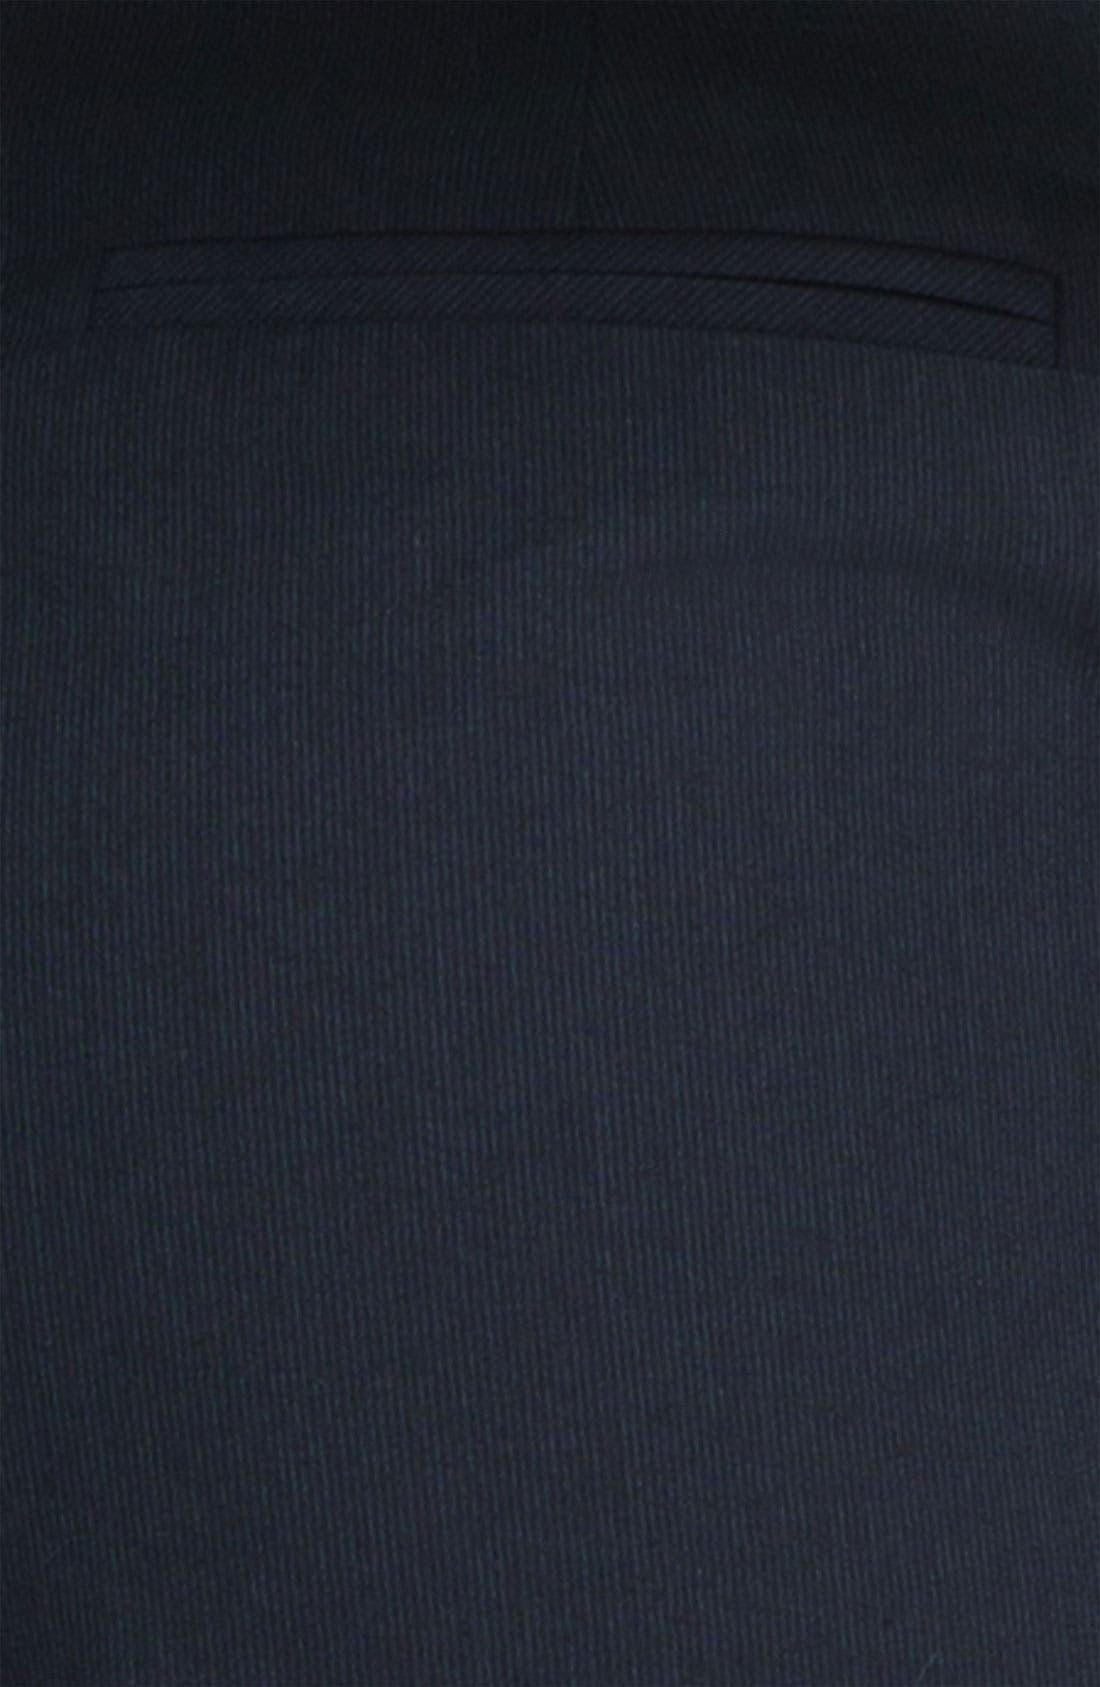 Alternate Image 3  - Halogen 'Taylor' Pinstripe Curvy Fit Pants